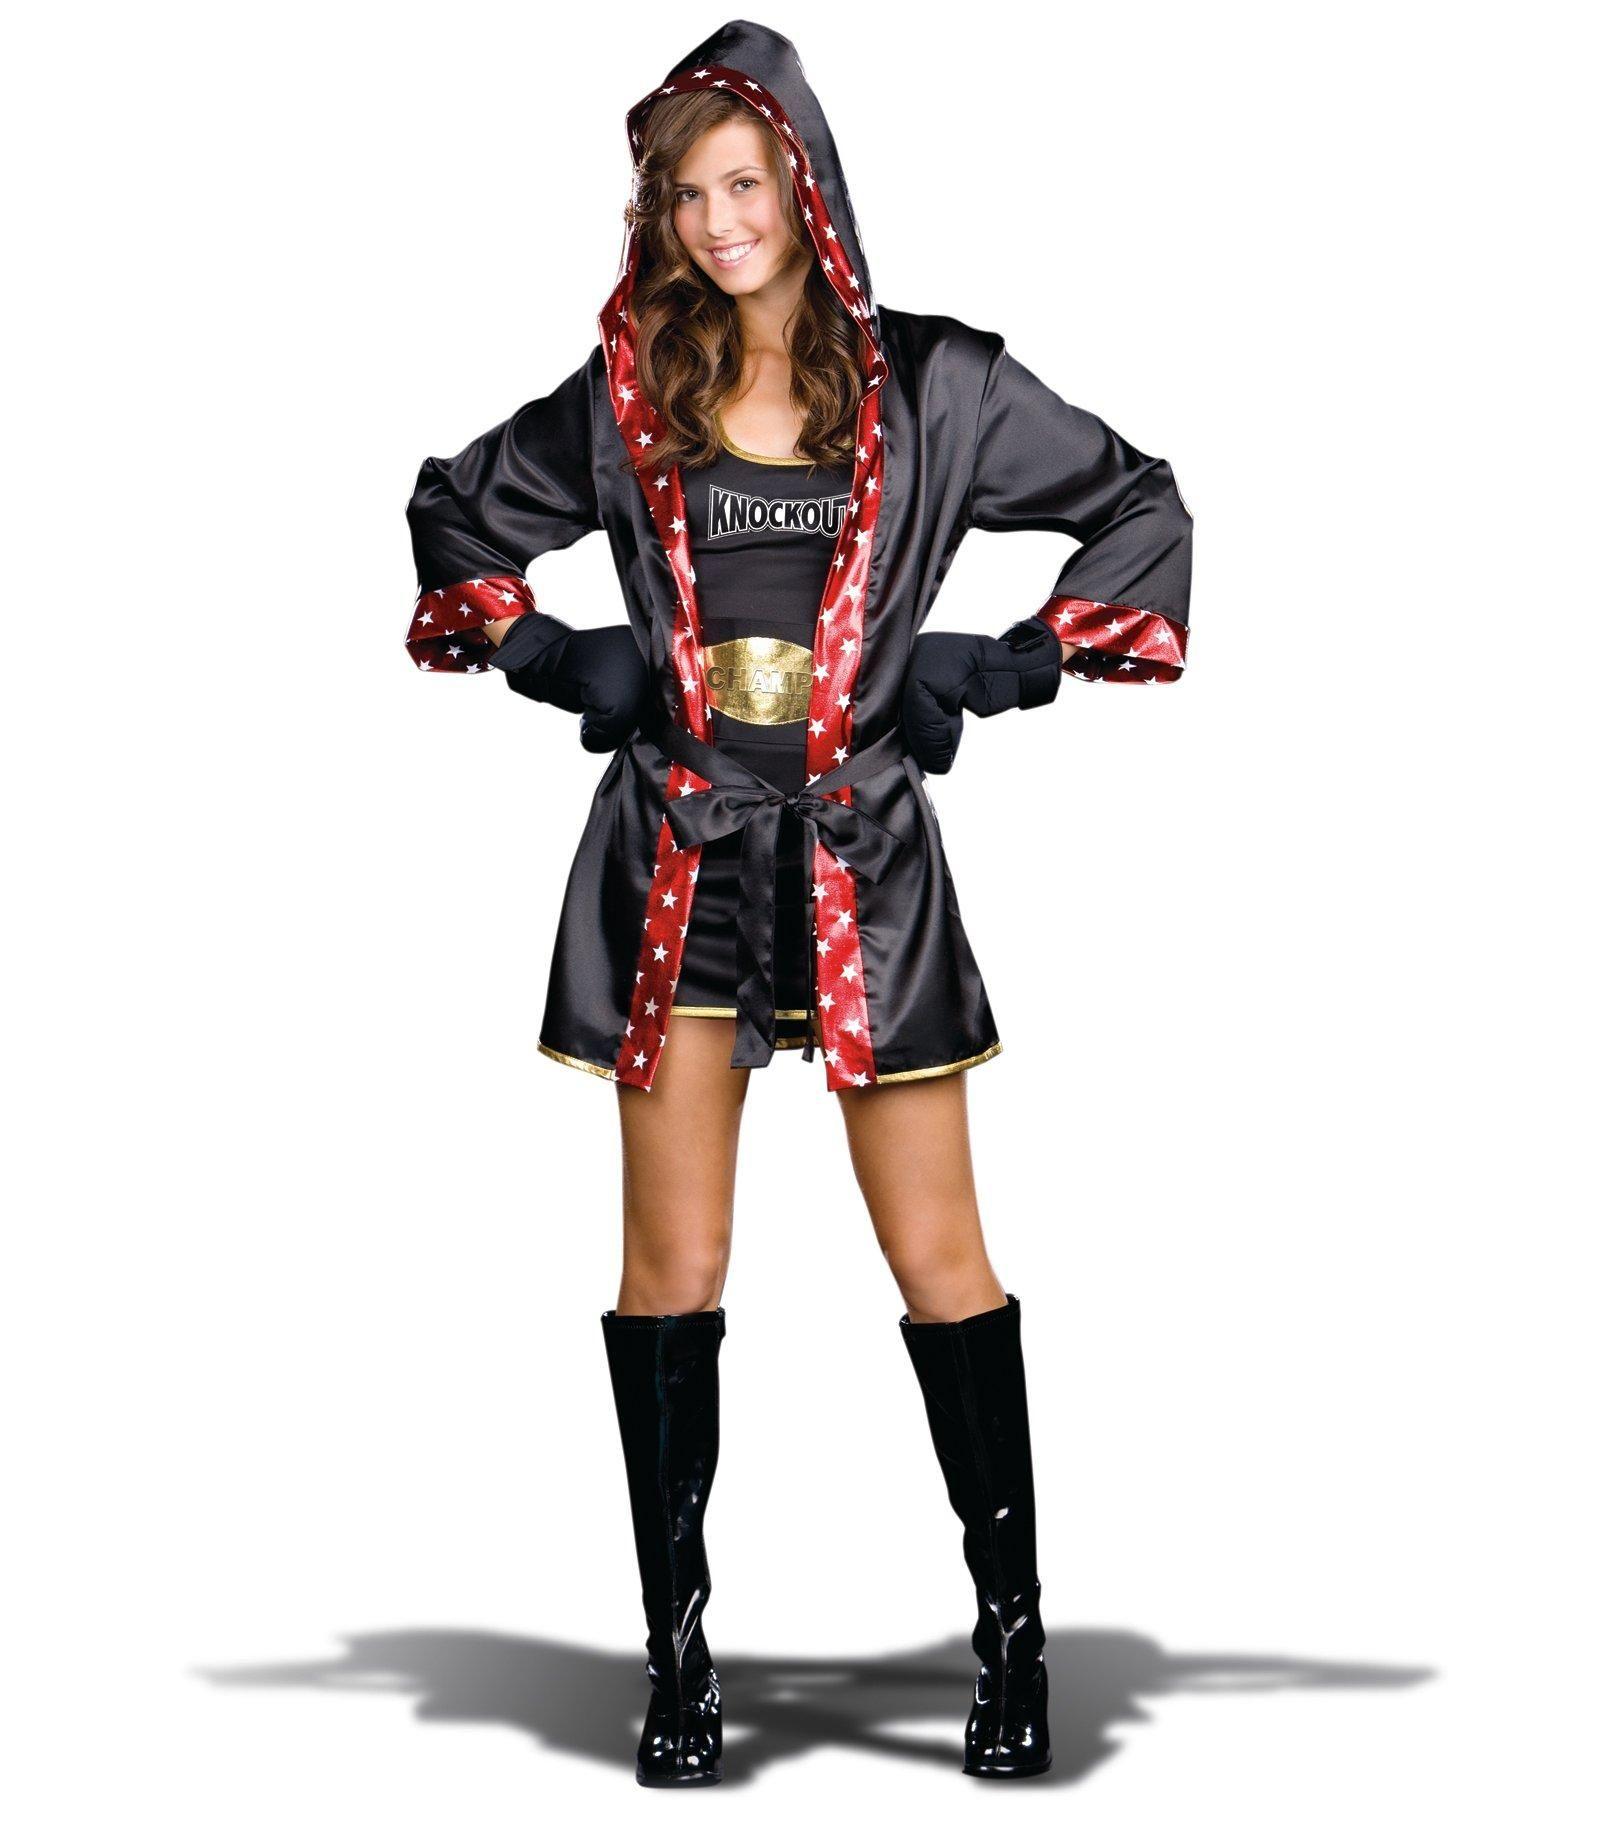 Cute Halloween Decorations Pinterest: Anime Halloween Teen Girl Costumes